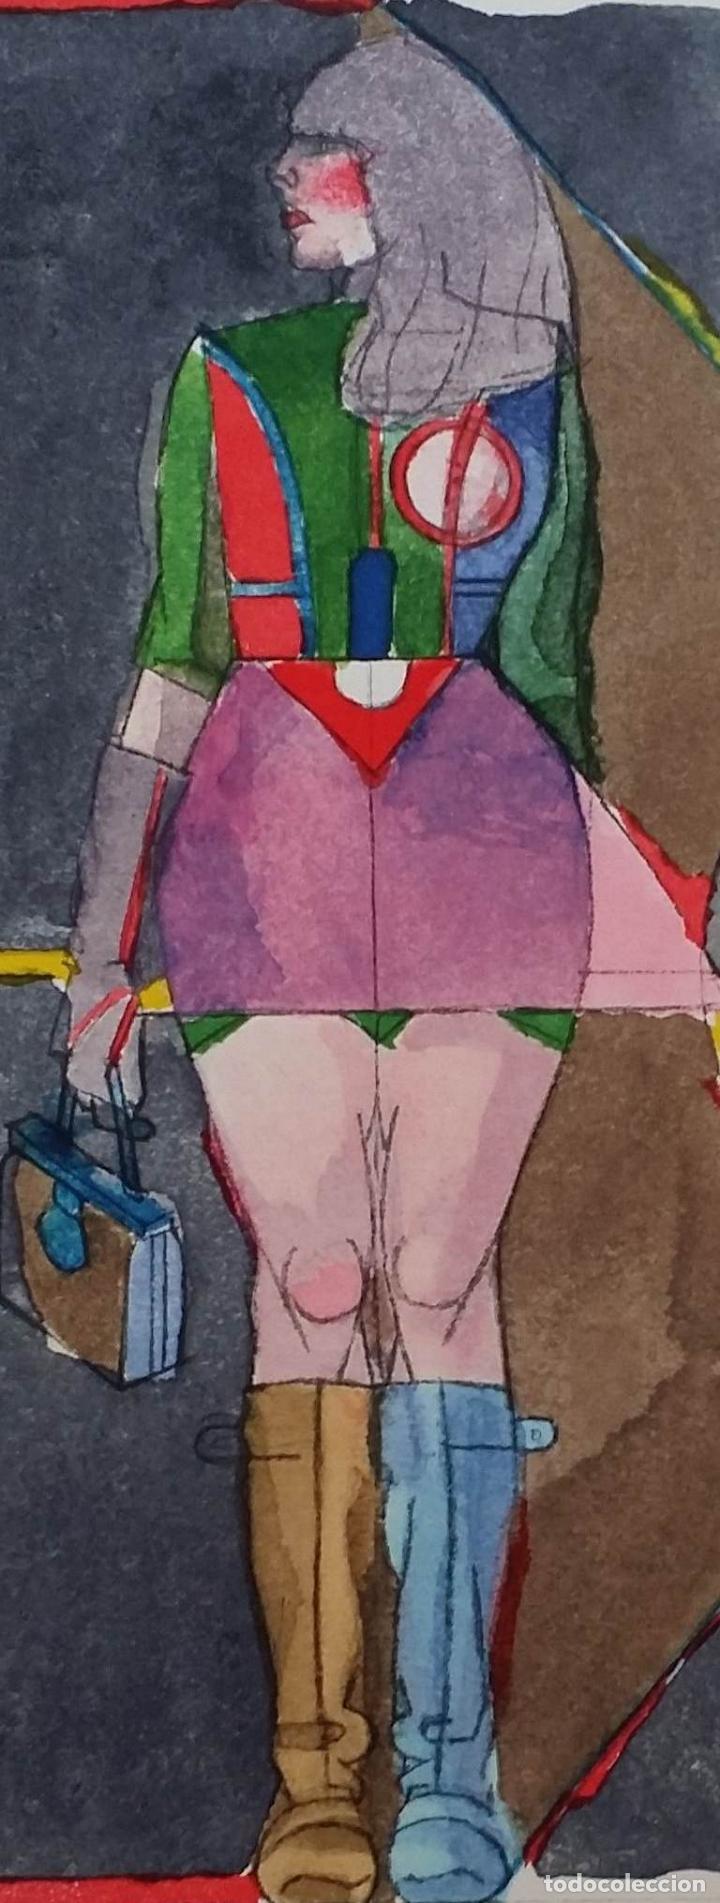 Arte: Richard Lindner: Super Girl, serigrafía de 1968 - Foto 5 - 158023806